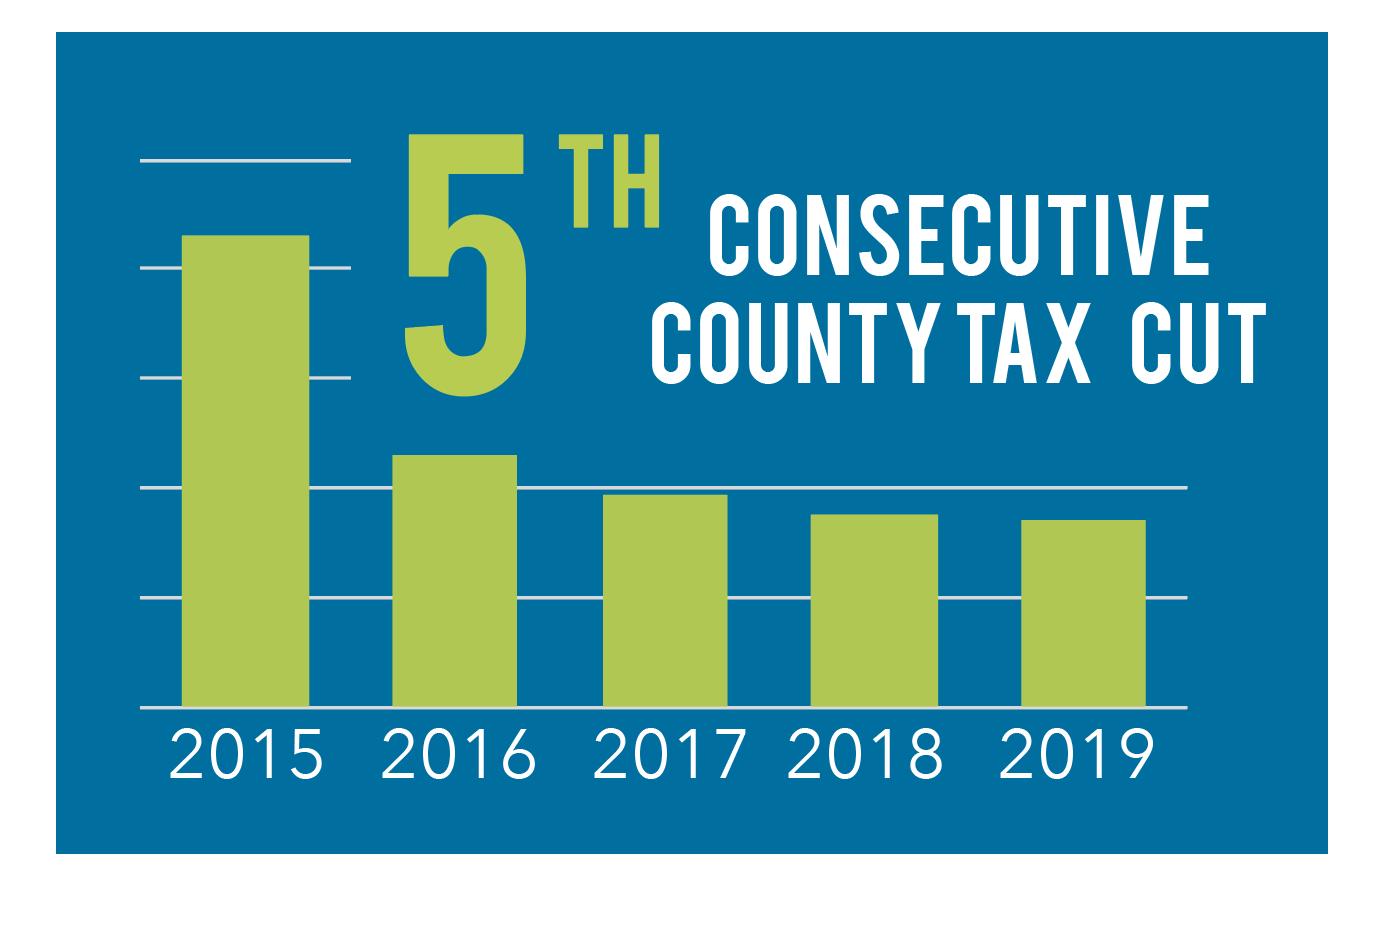 5th Consecutive County Tax Cut